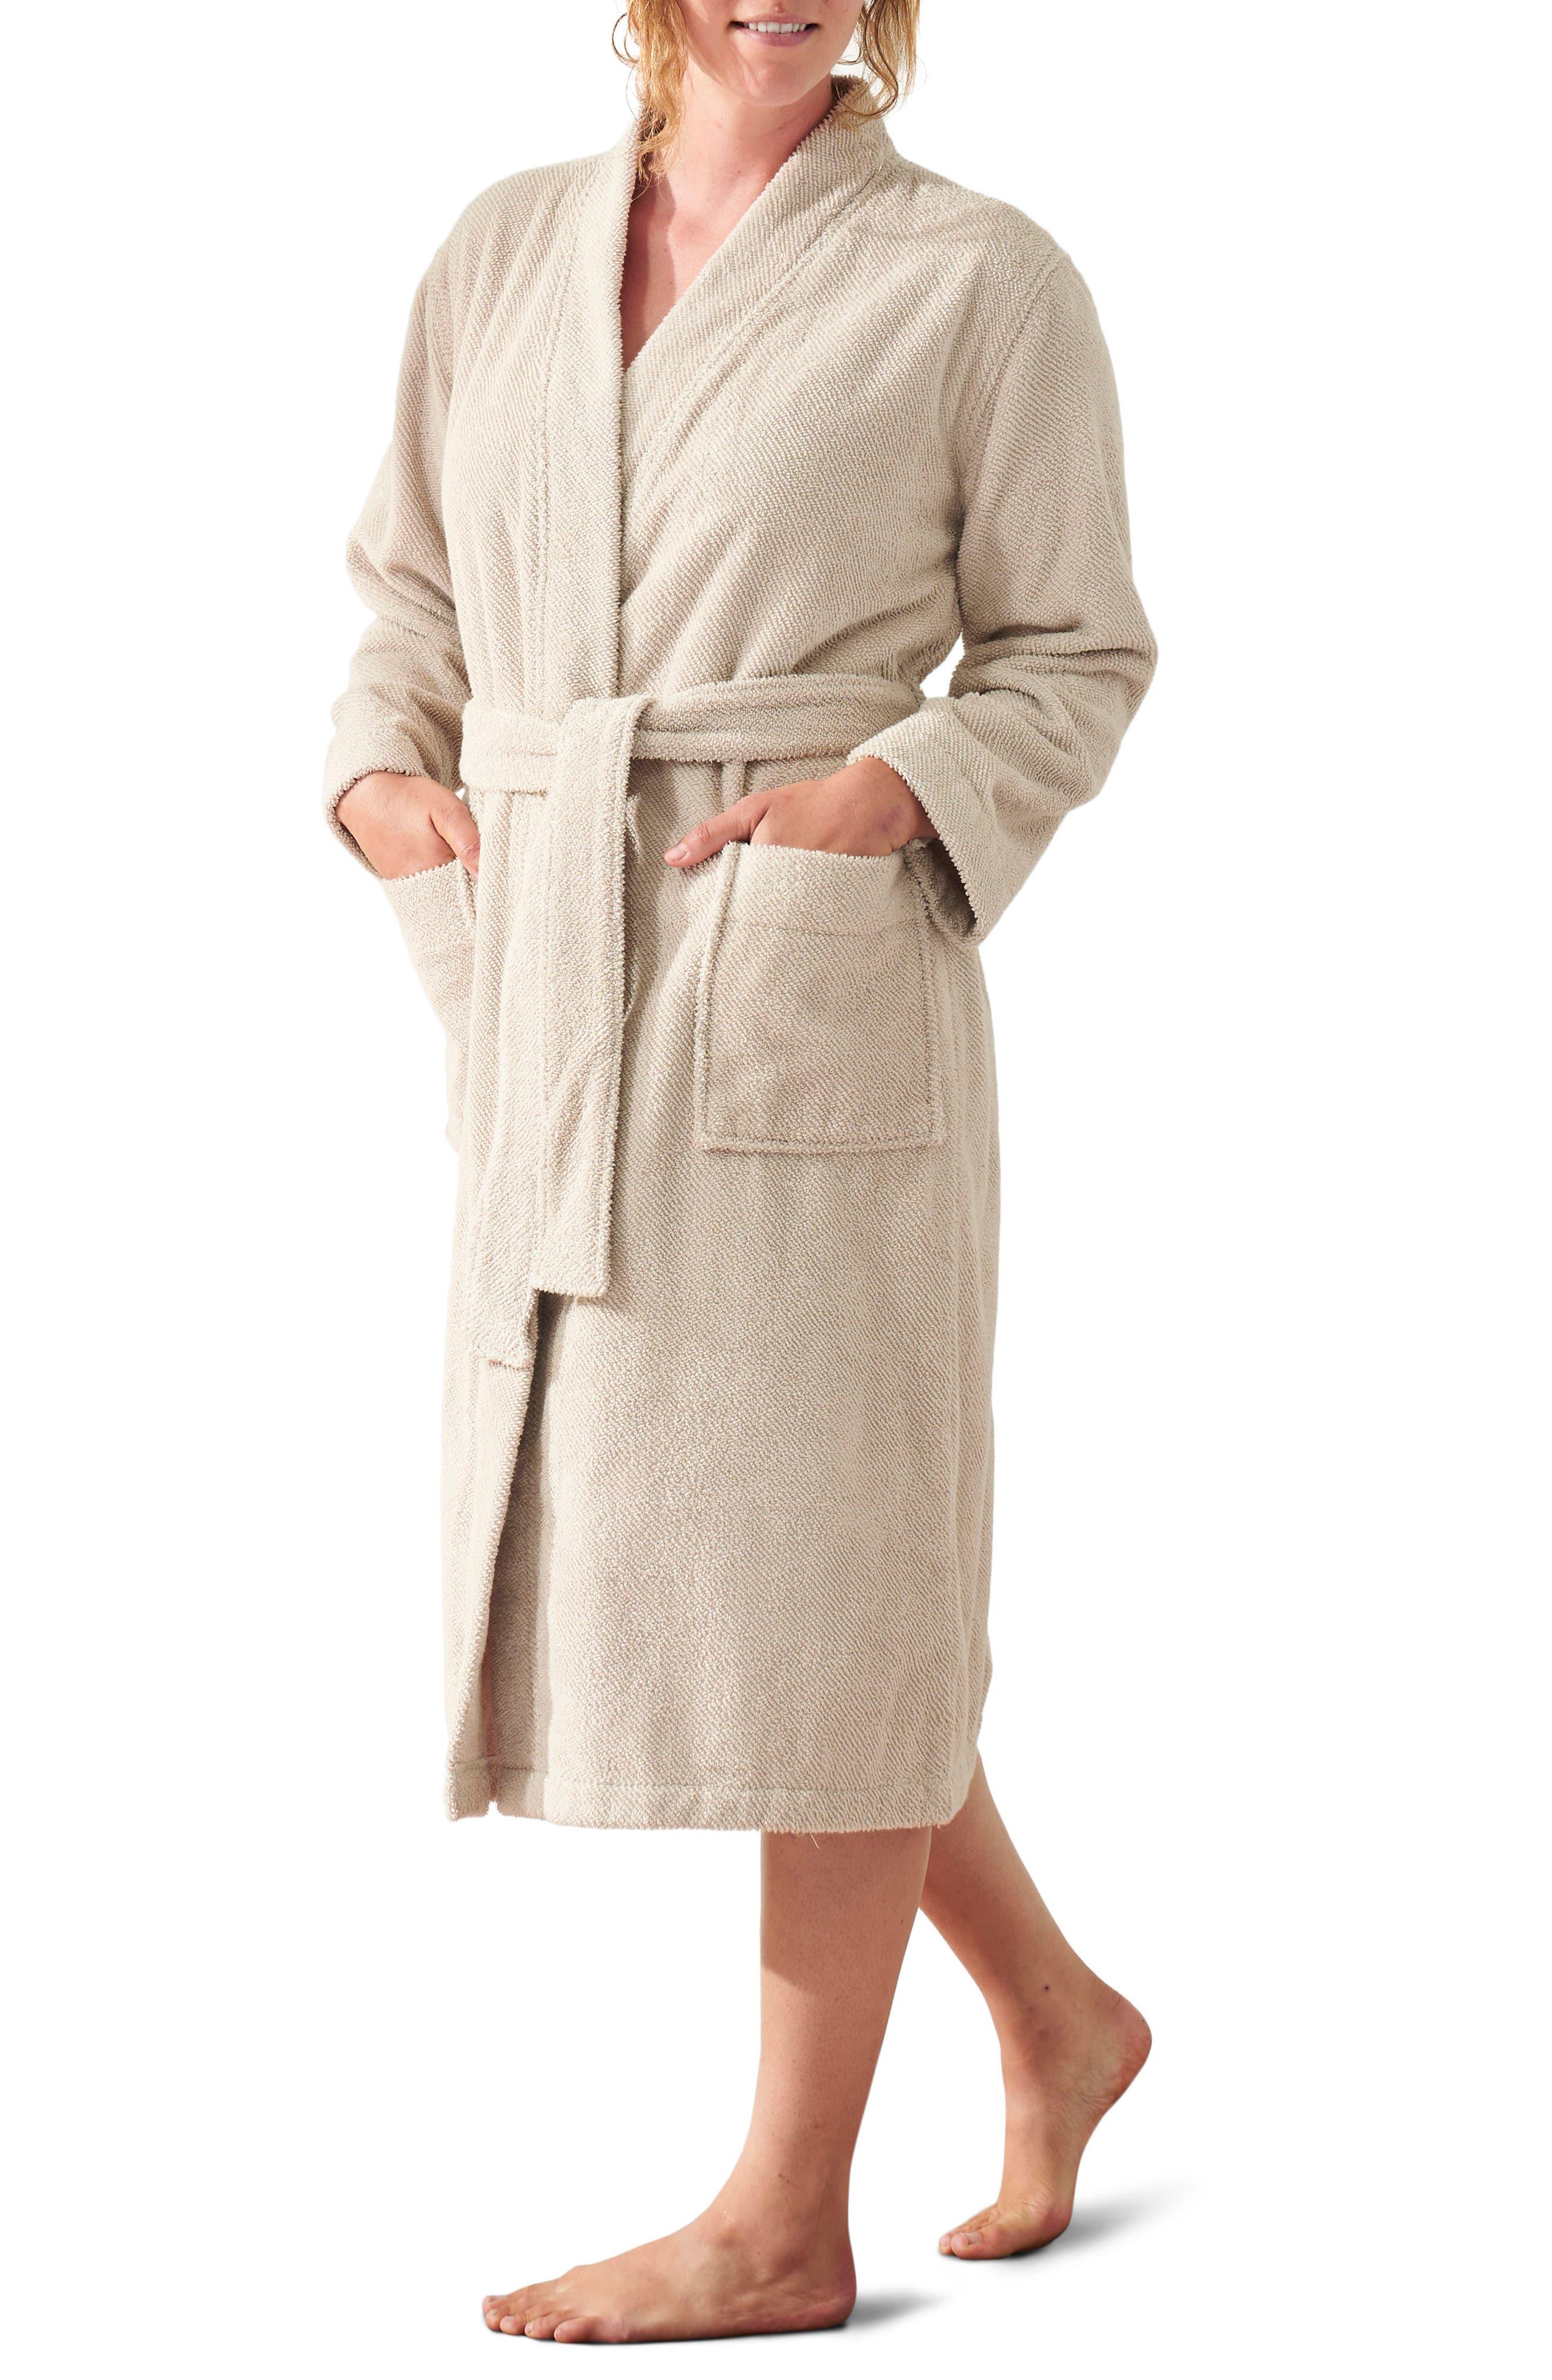 Air Weight(TM) Unisex Organic Cotton Robe